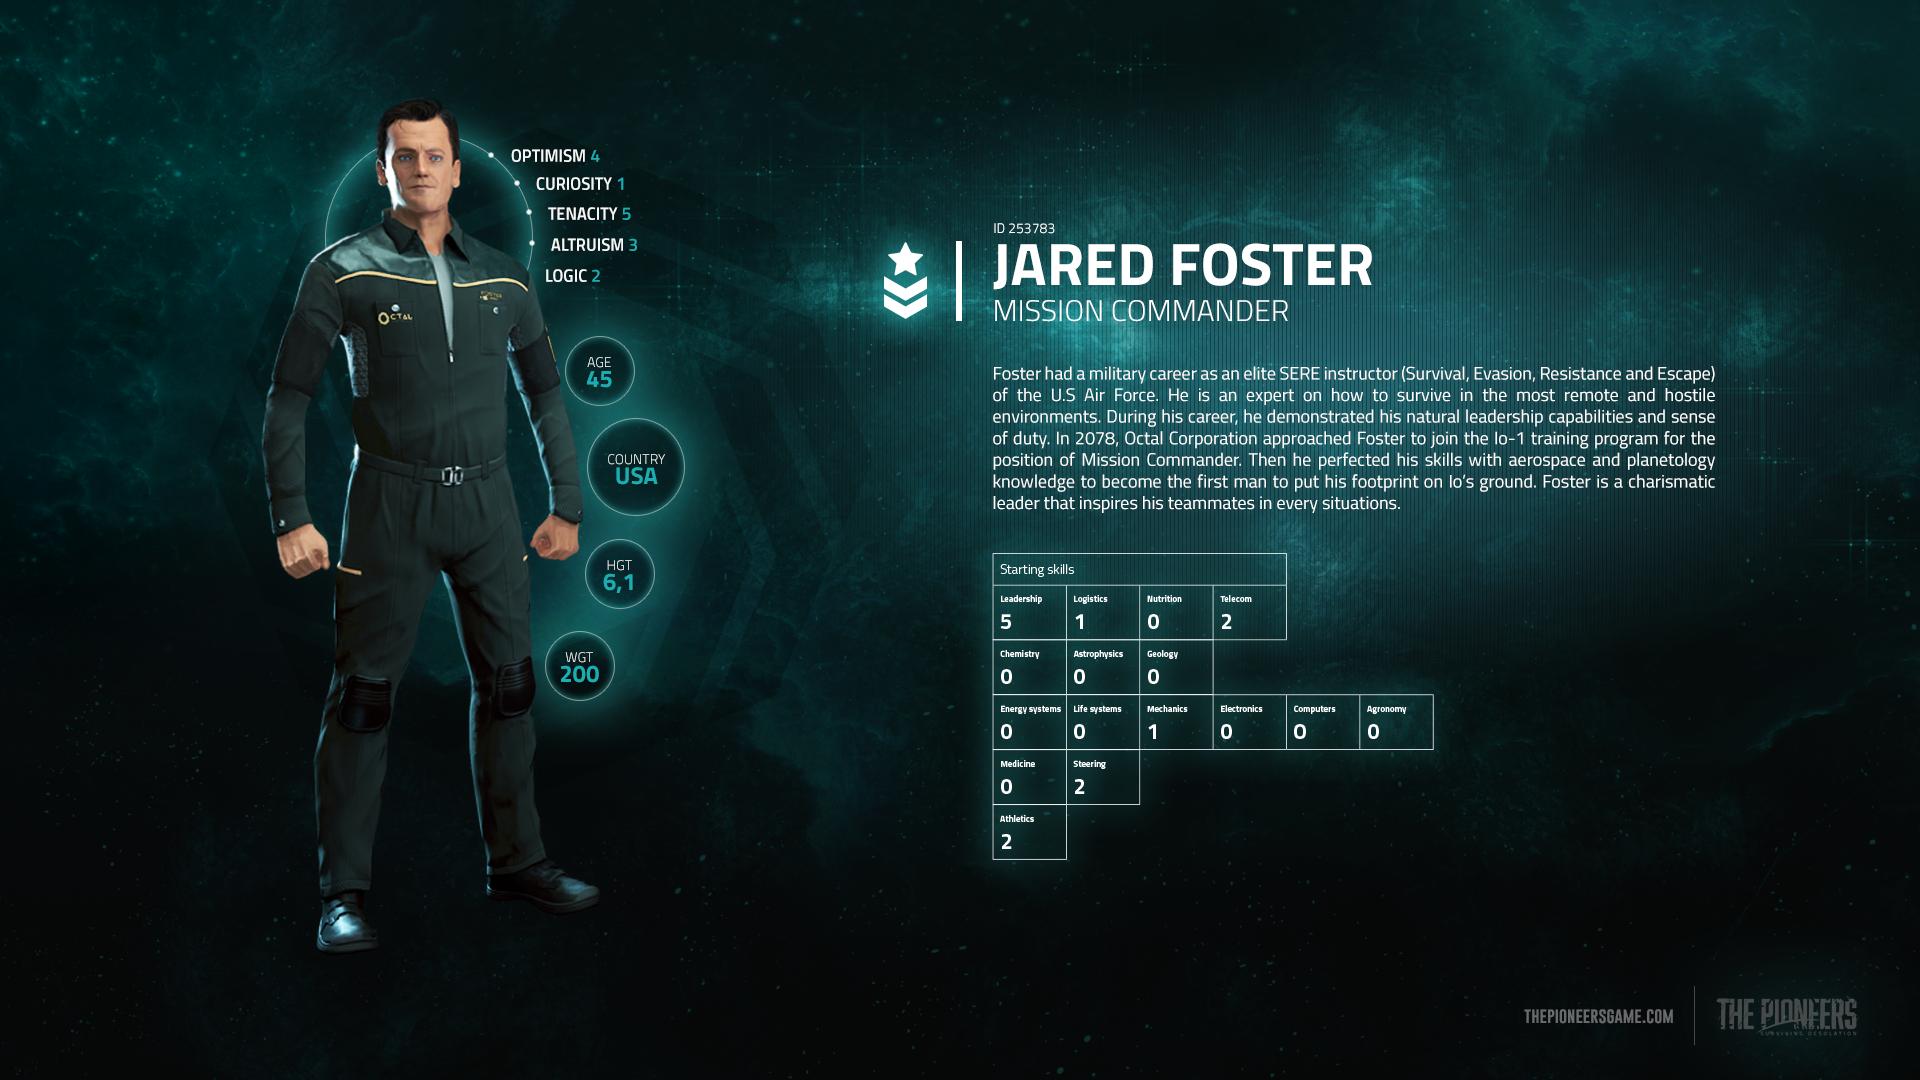 JaredFoster